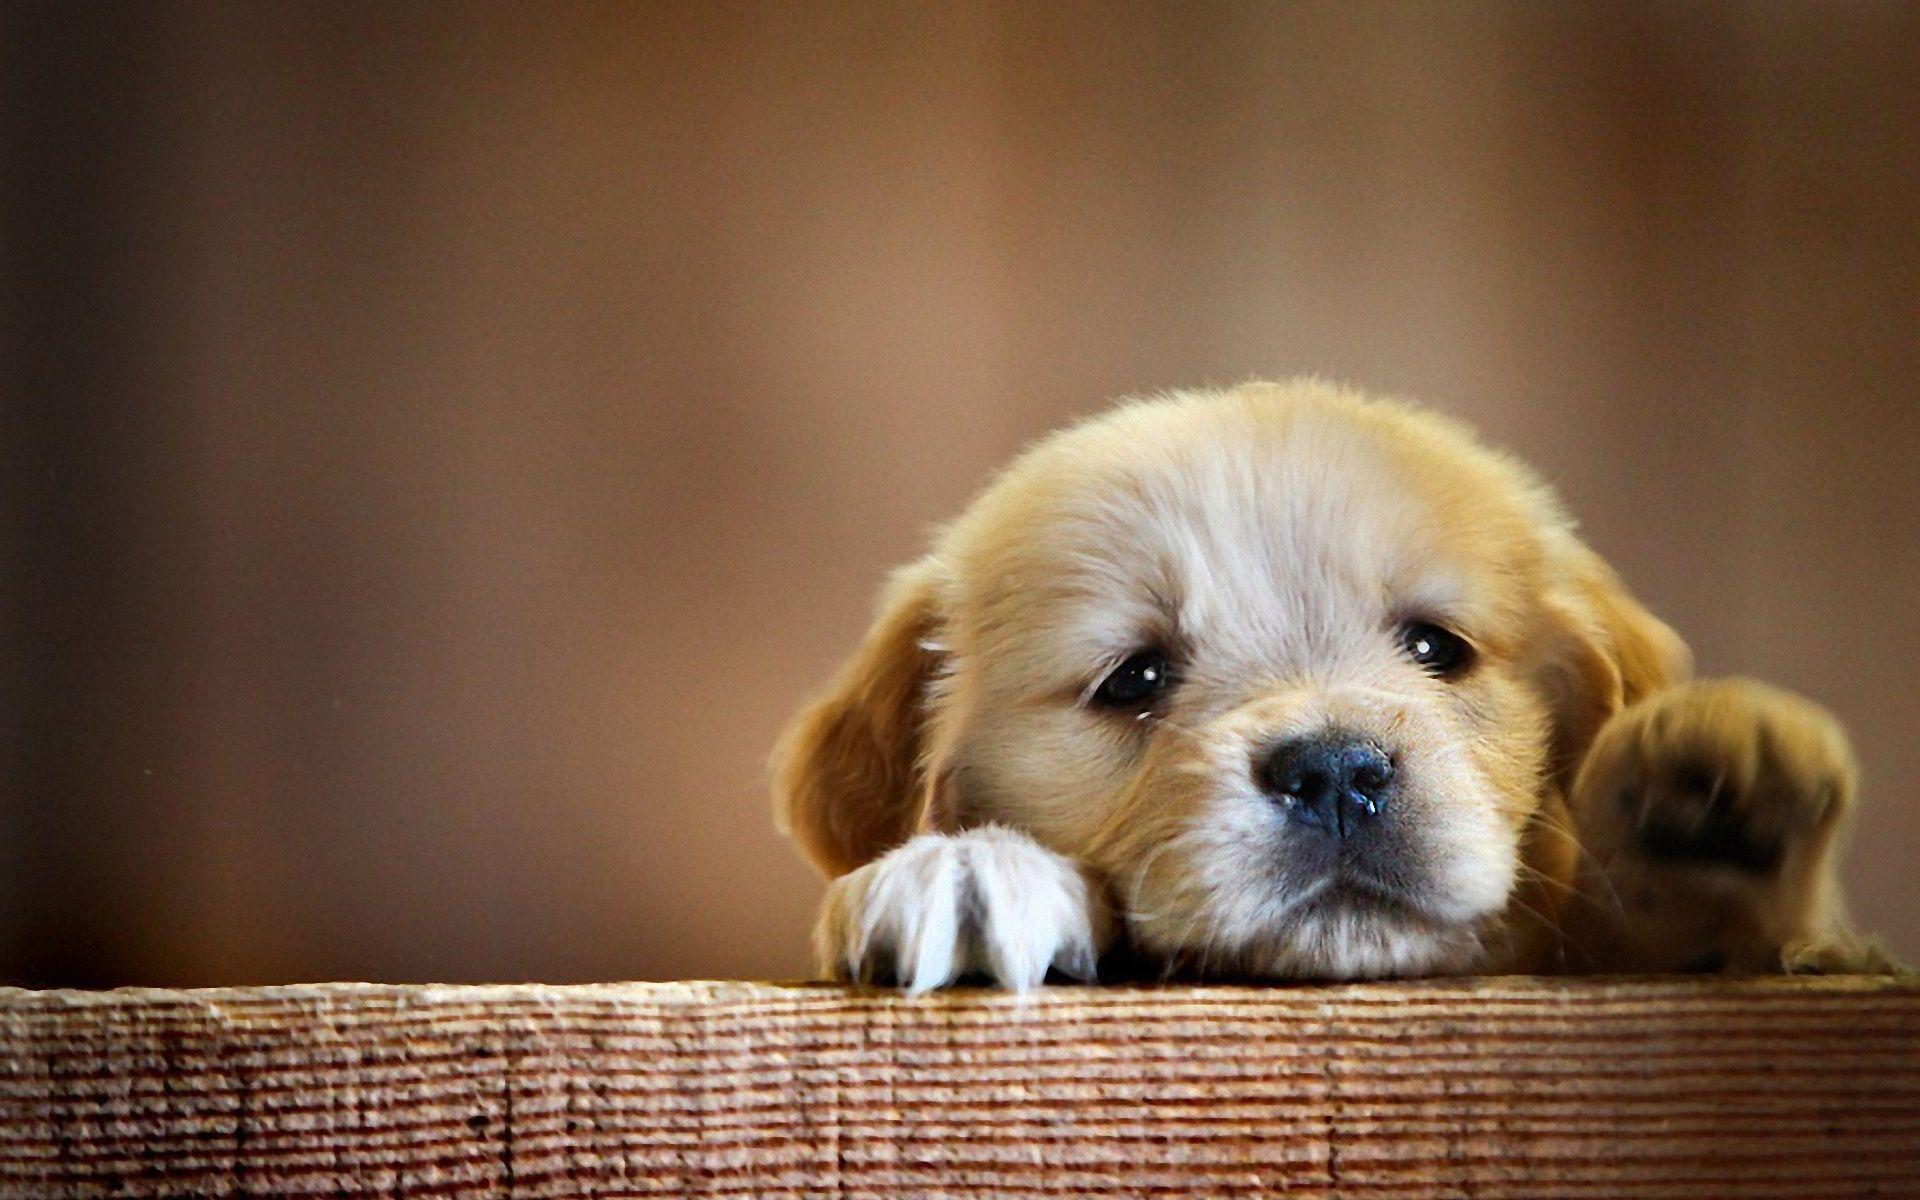 Cute Puppy Wide Desktop Background Wallpapers Hd Free 578005 Cute Baby Dogs Cute Puppy Wallpaper Cute Dog Wallpaper